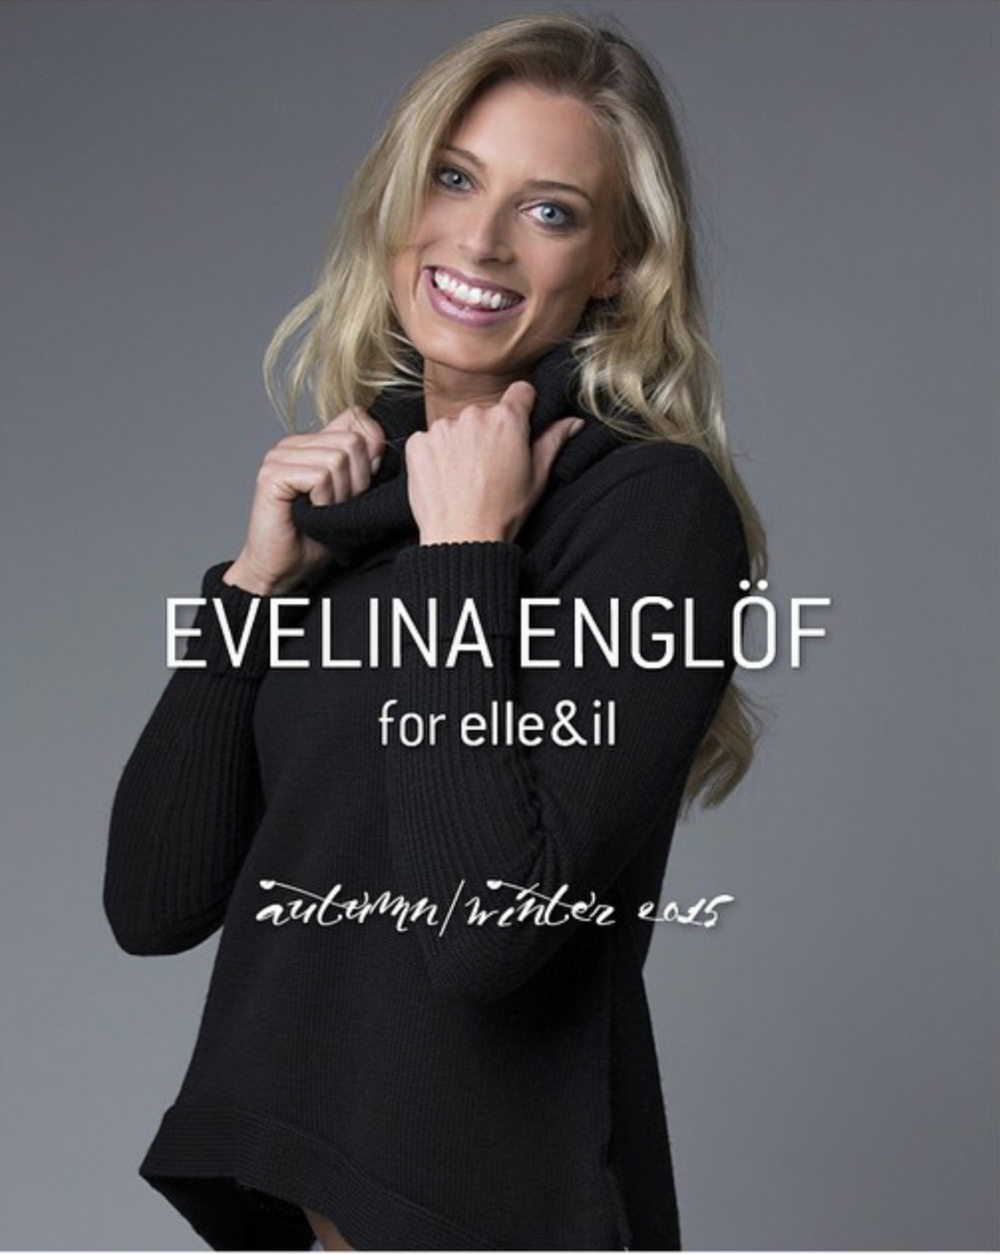 Evelina.png